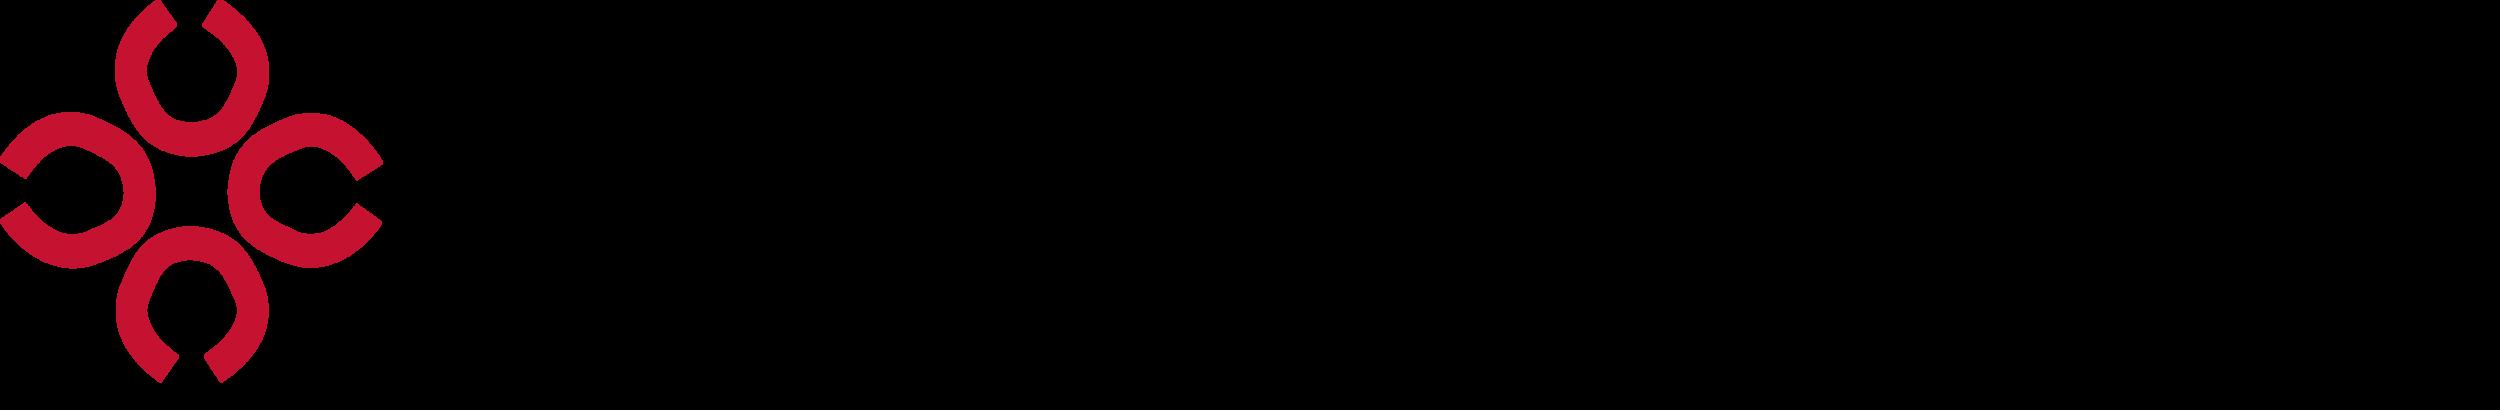 1DC16 Sponsor Logo Secretariat International.png